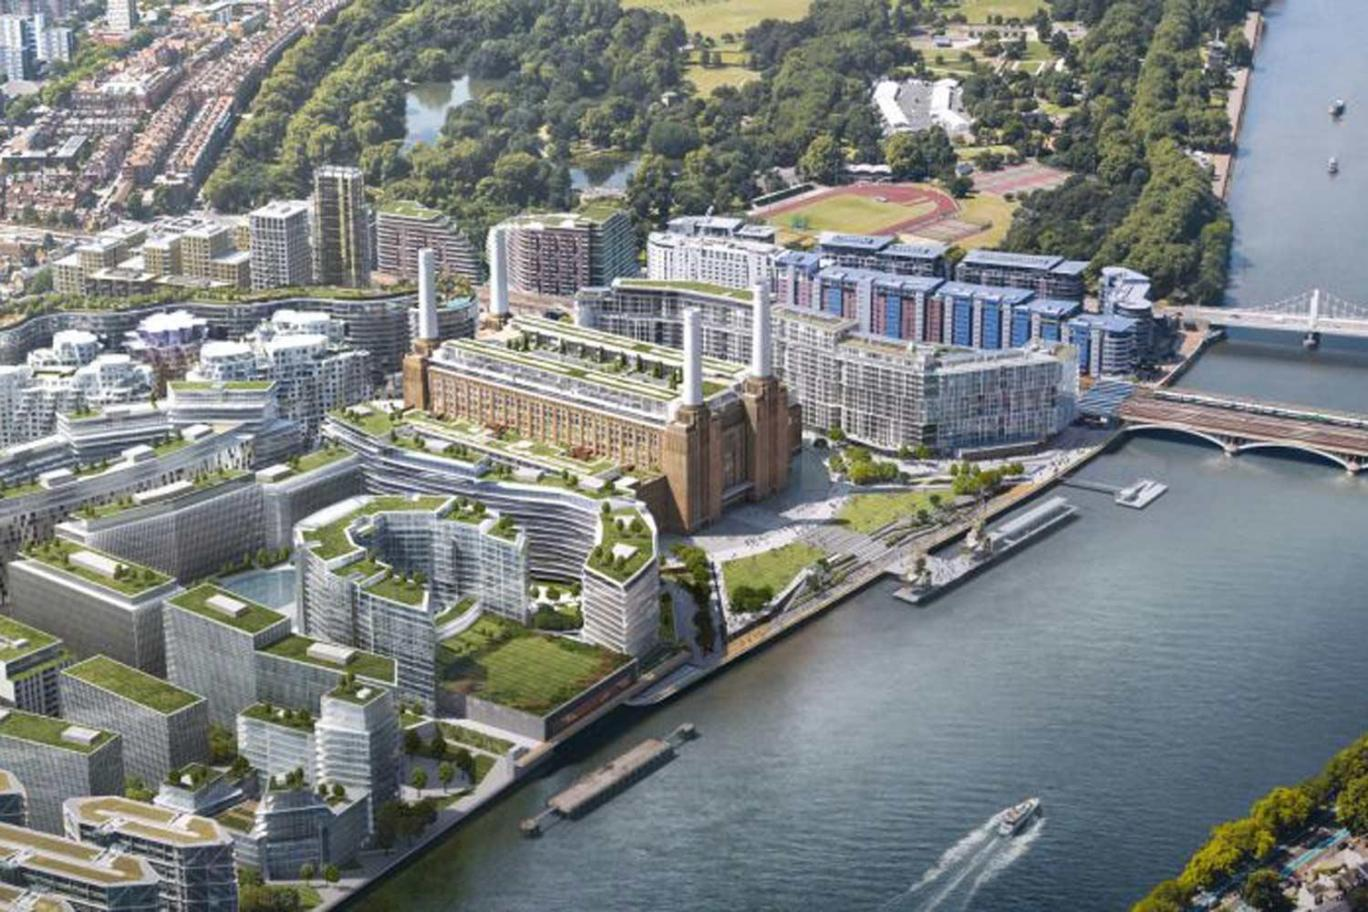 Battersea Power Station site